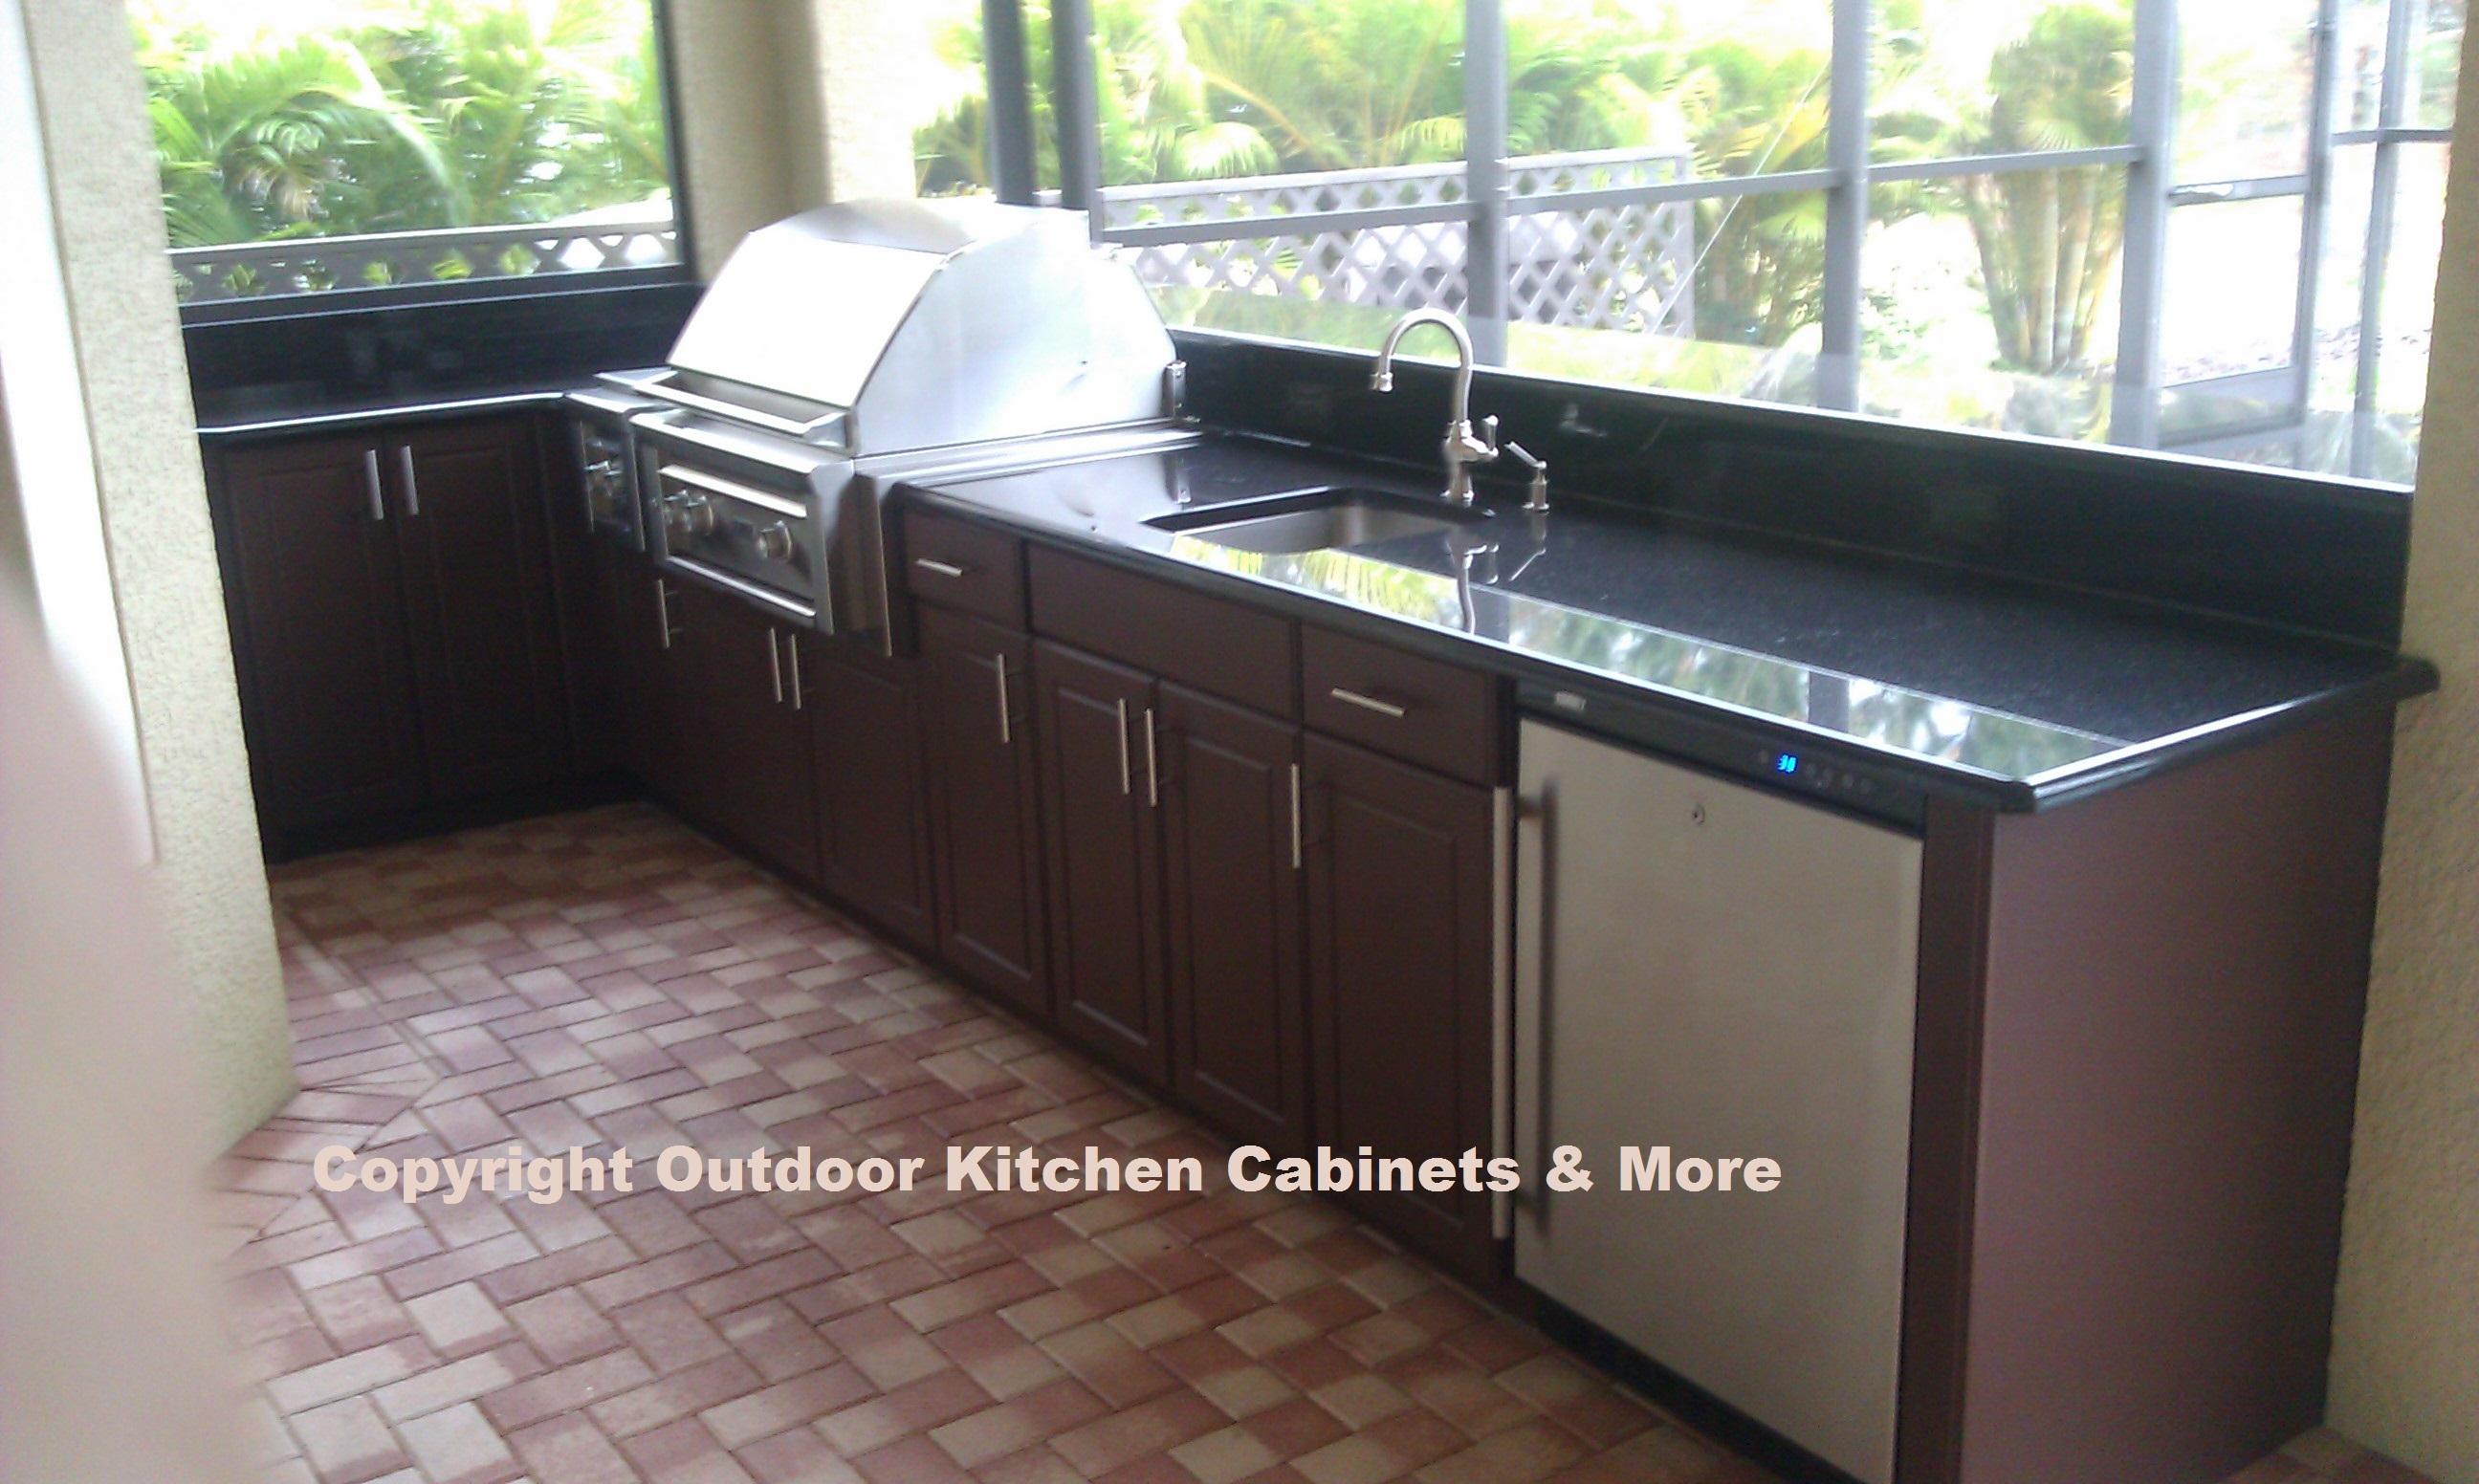 outdoorkitchencabinetsandmore outdoor kitchen cabinets switlyke odk